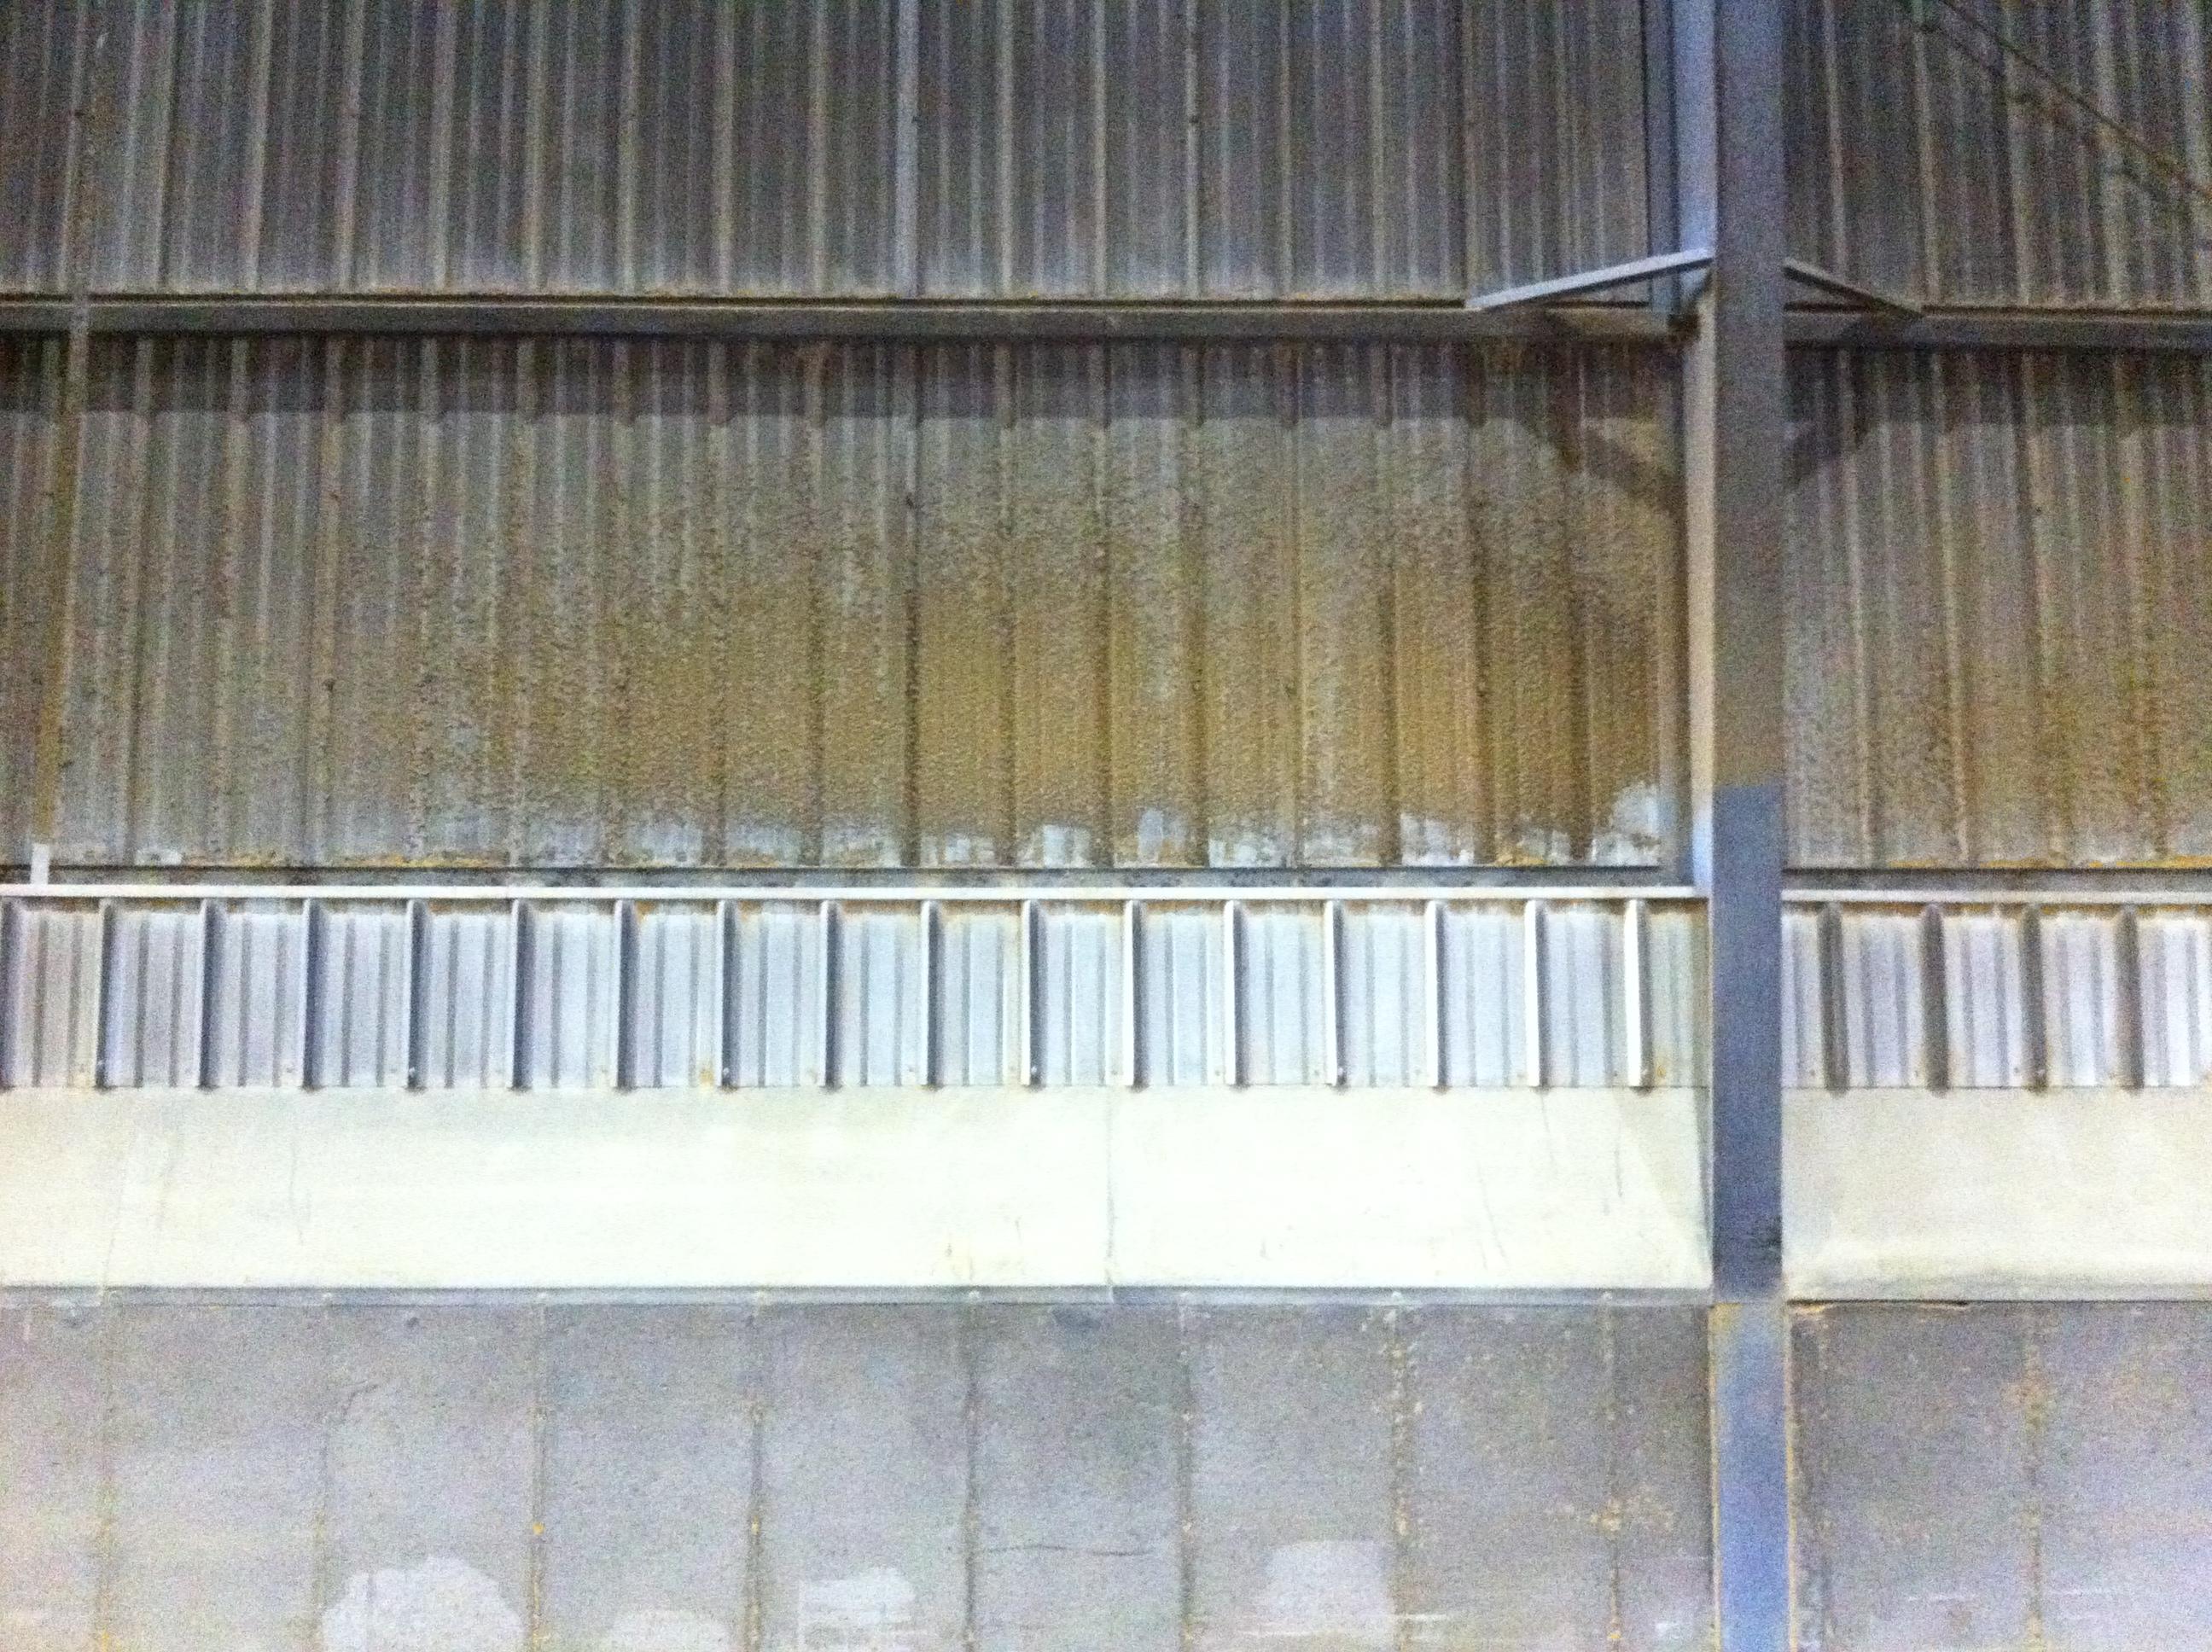 dry ice blasting ethanol